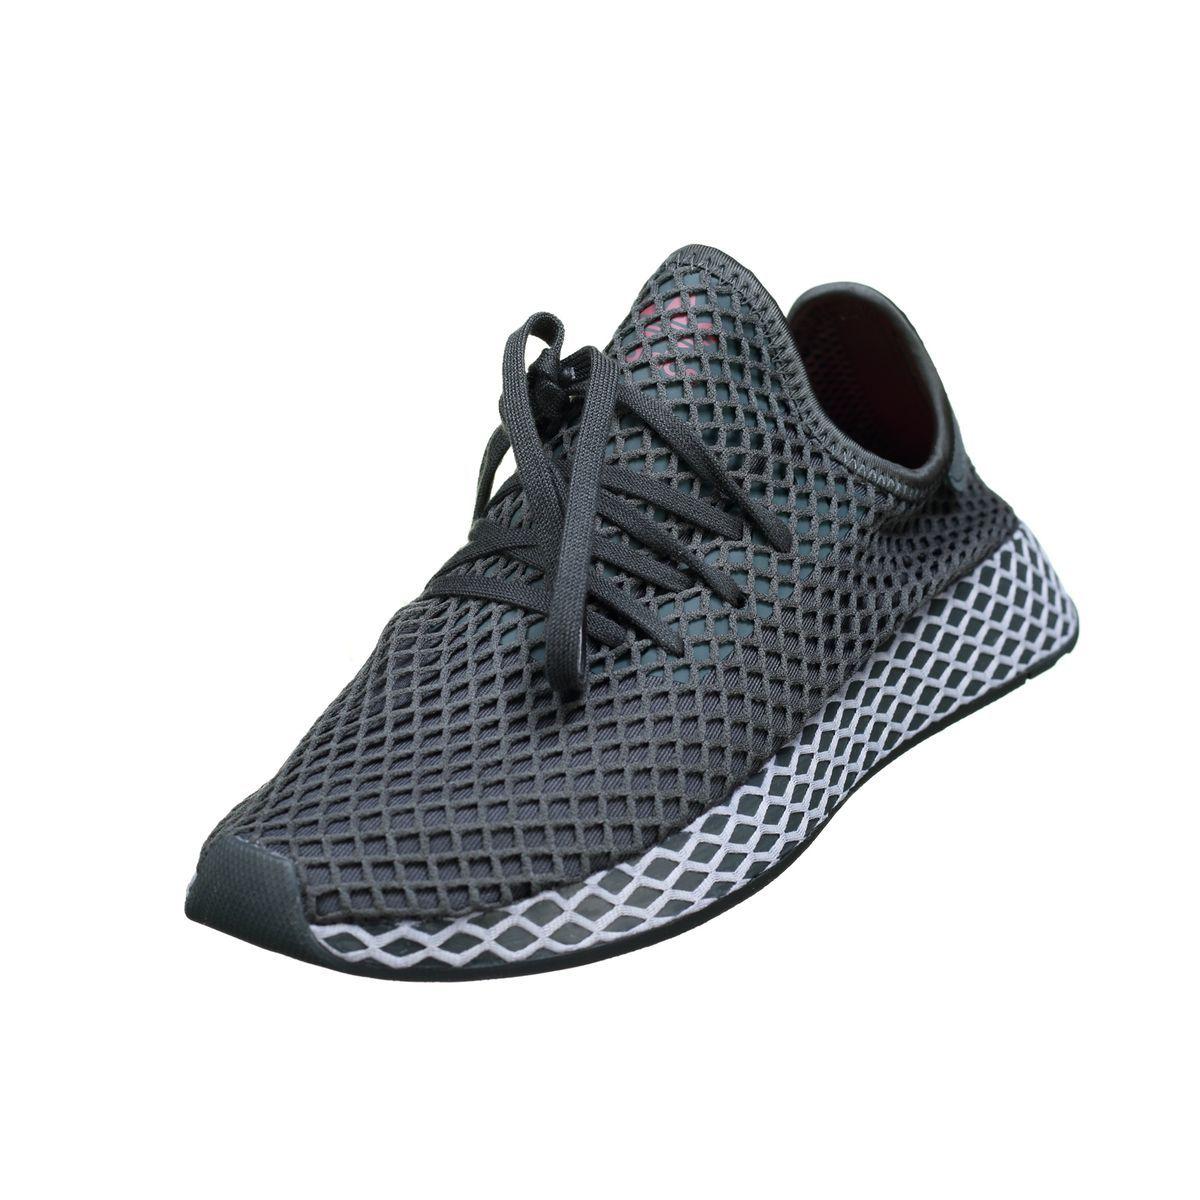 Basket Adidas Originals Deerupt Runner Junior Ref. Cm8659